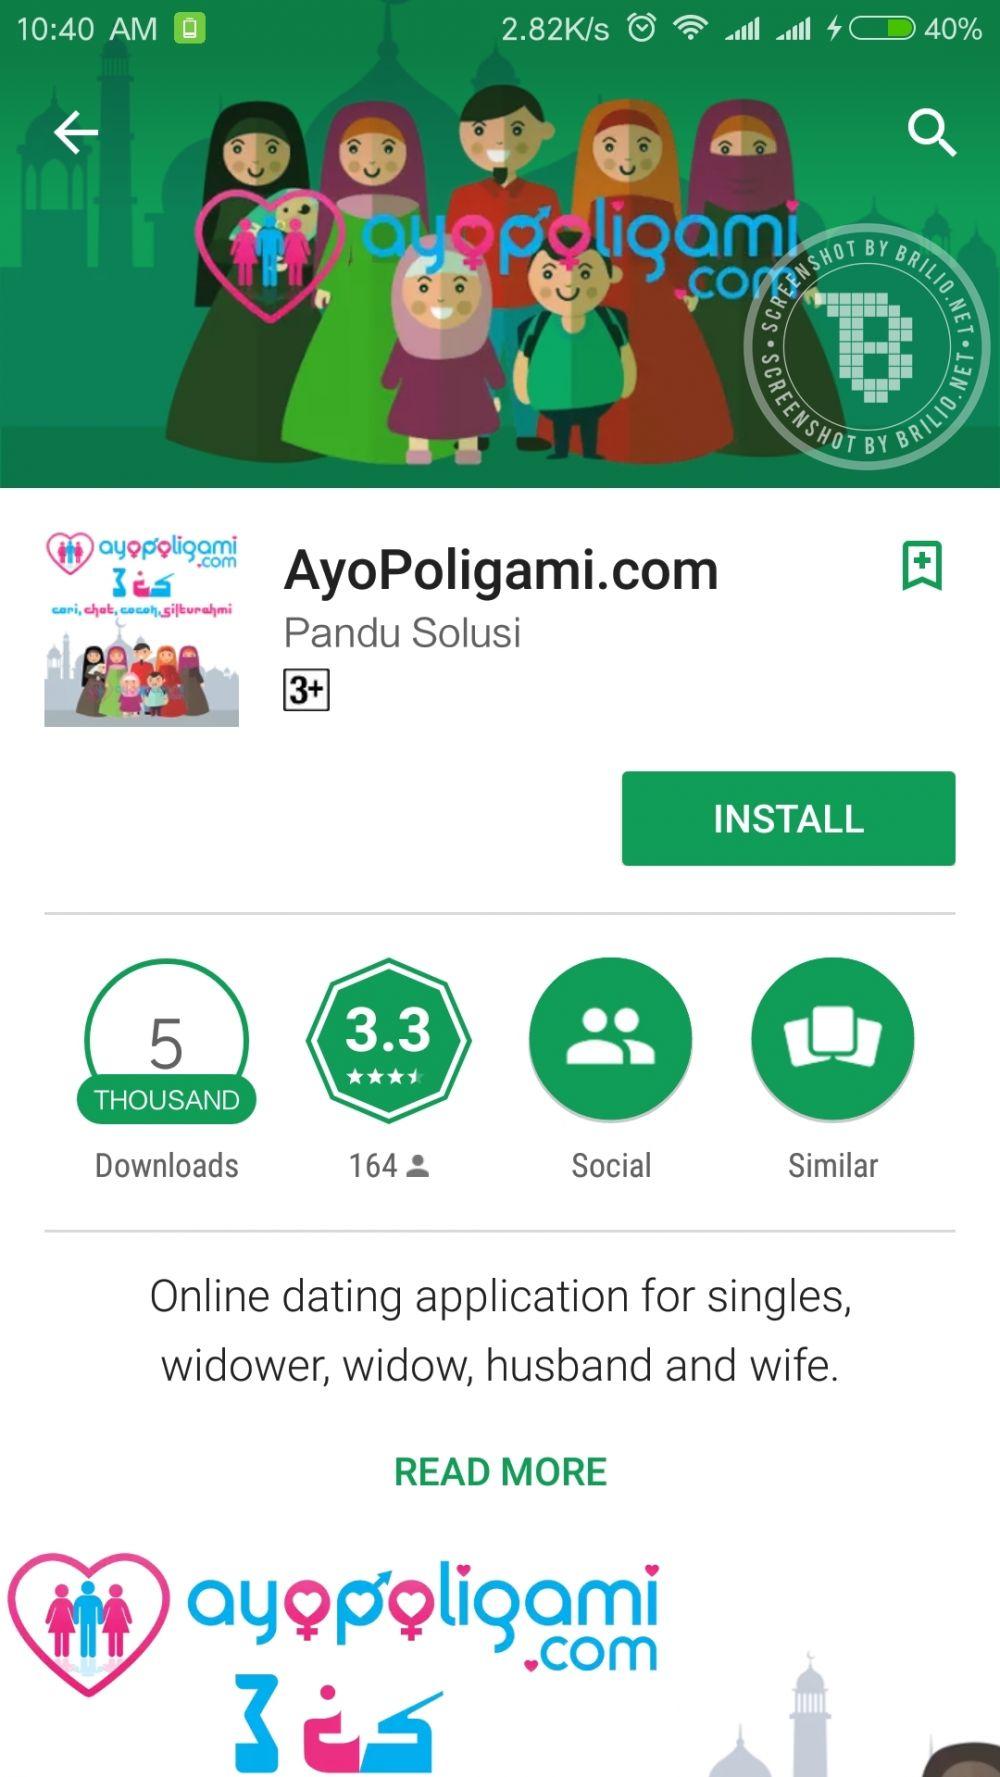 fakta aplikasi ayopoligami © 2017 brilio.net